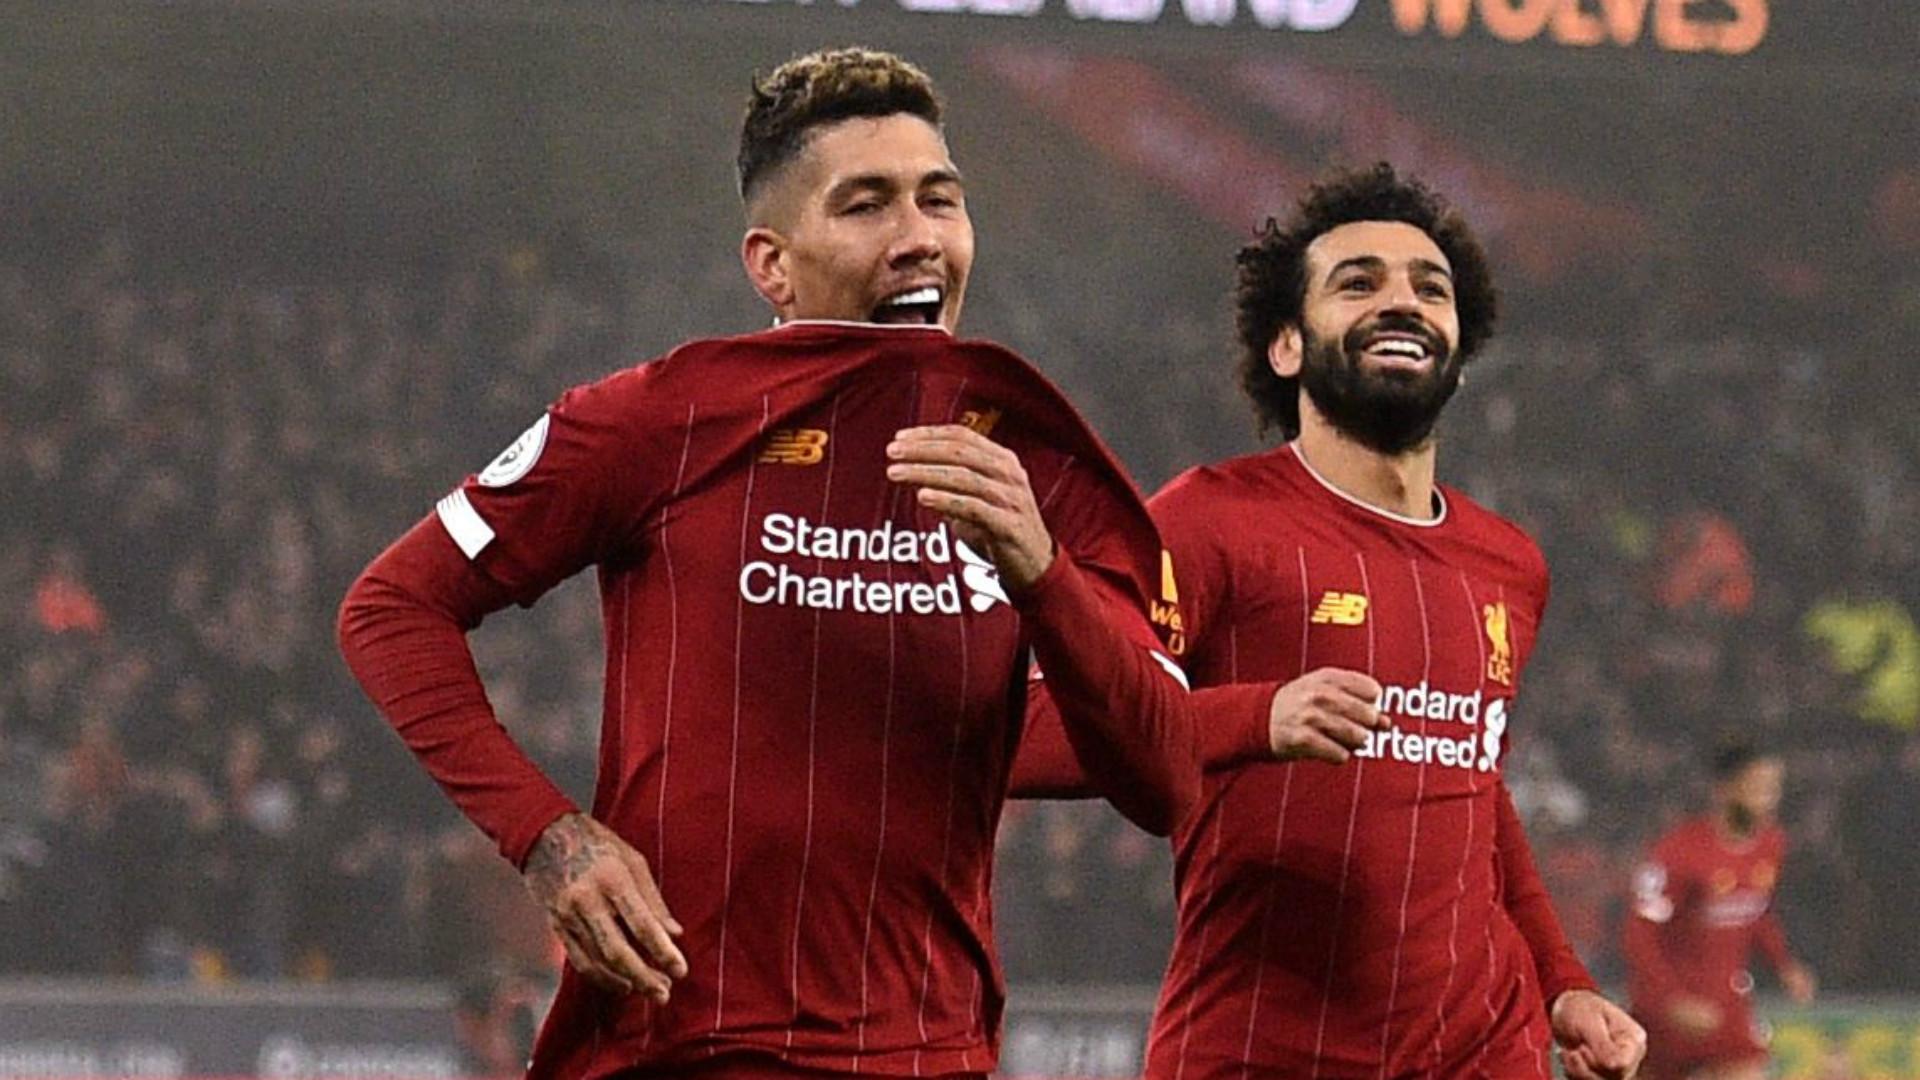 Liverpool vs Atletico Madrid was a Deja Vu